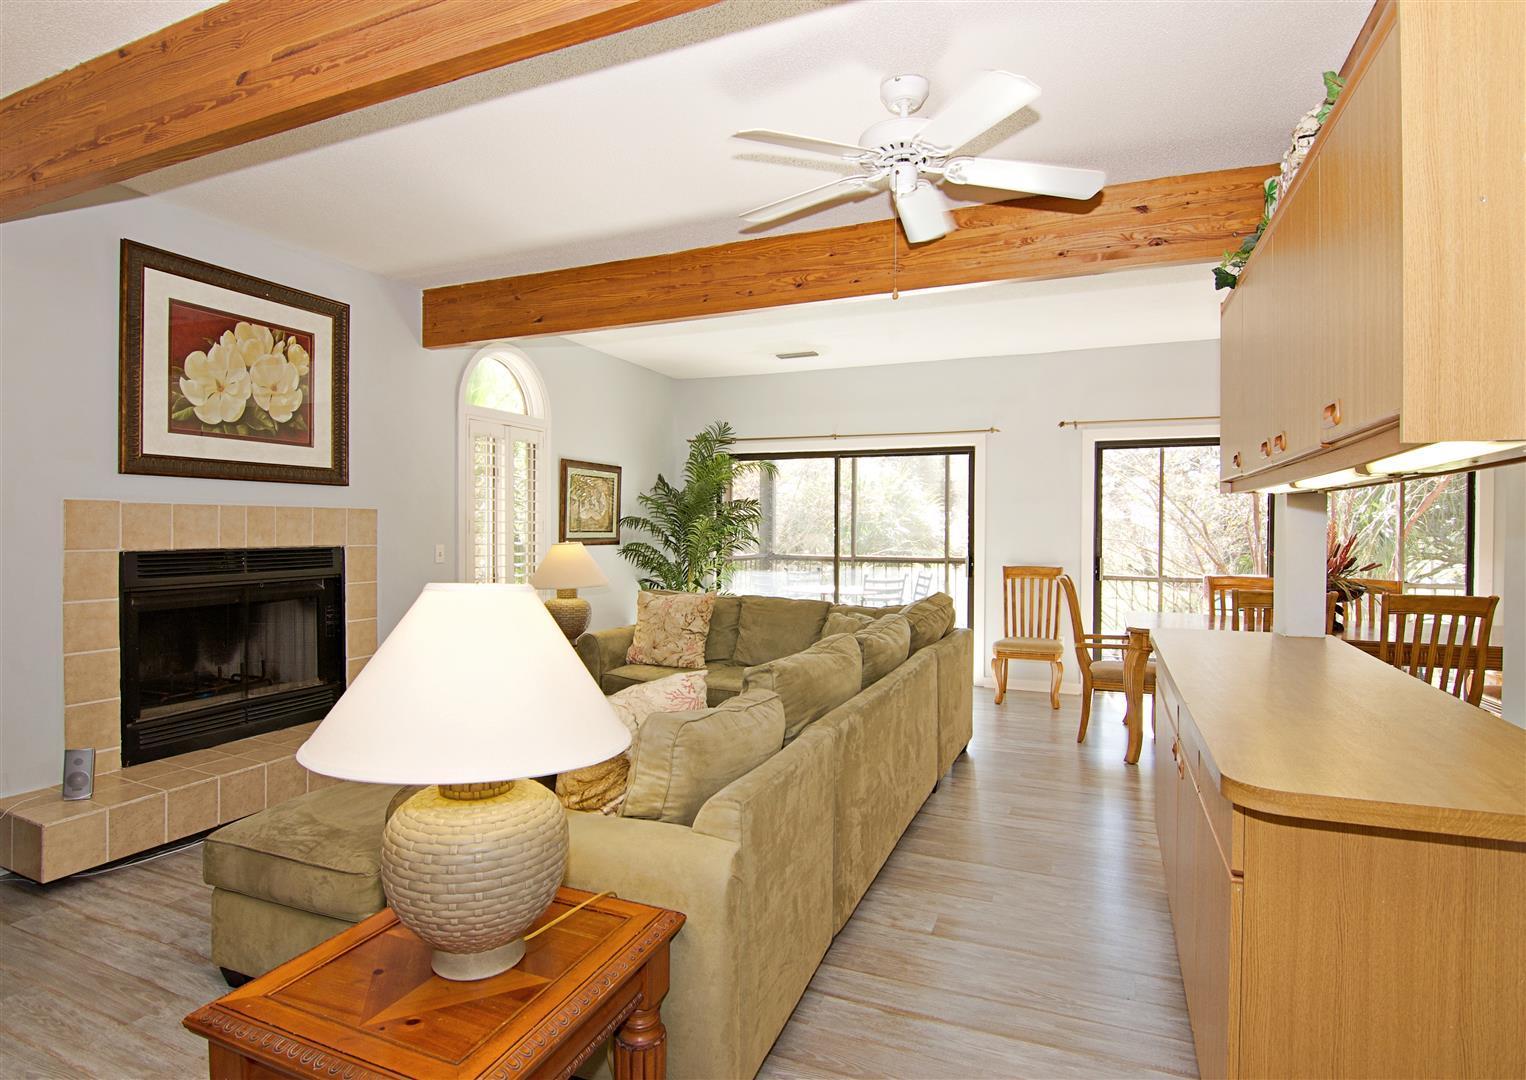 Seabrook Island Homes For Sale - 3020 Ocean Winds, Seabrook Island, SC - 3